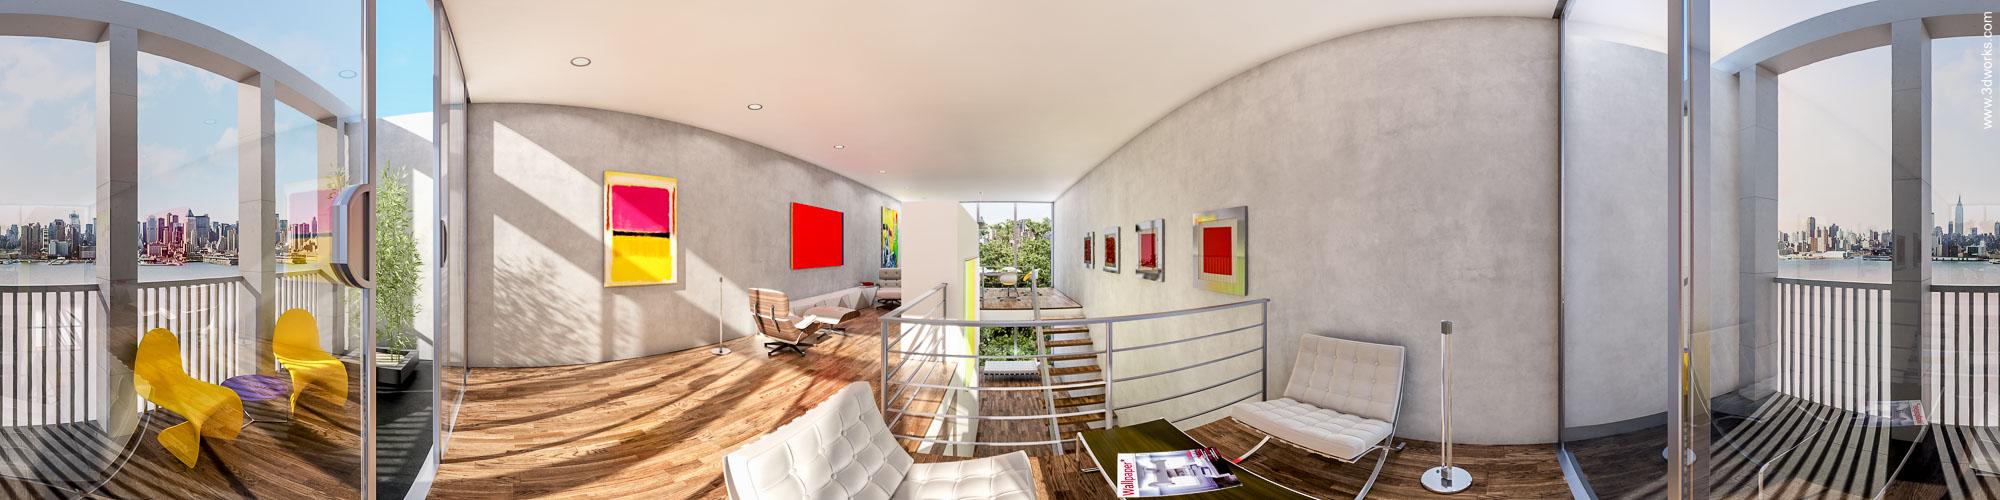 3D Visualisierung, Townhouse 180 Grad Panorama, Innenraumstudie